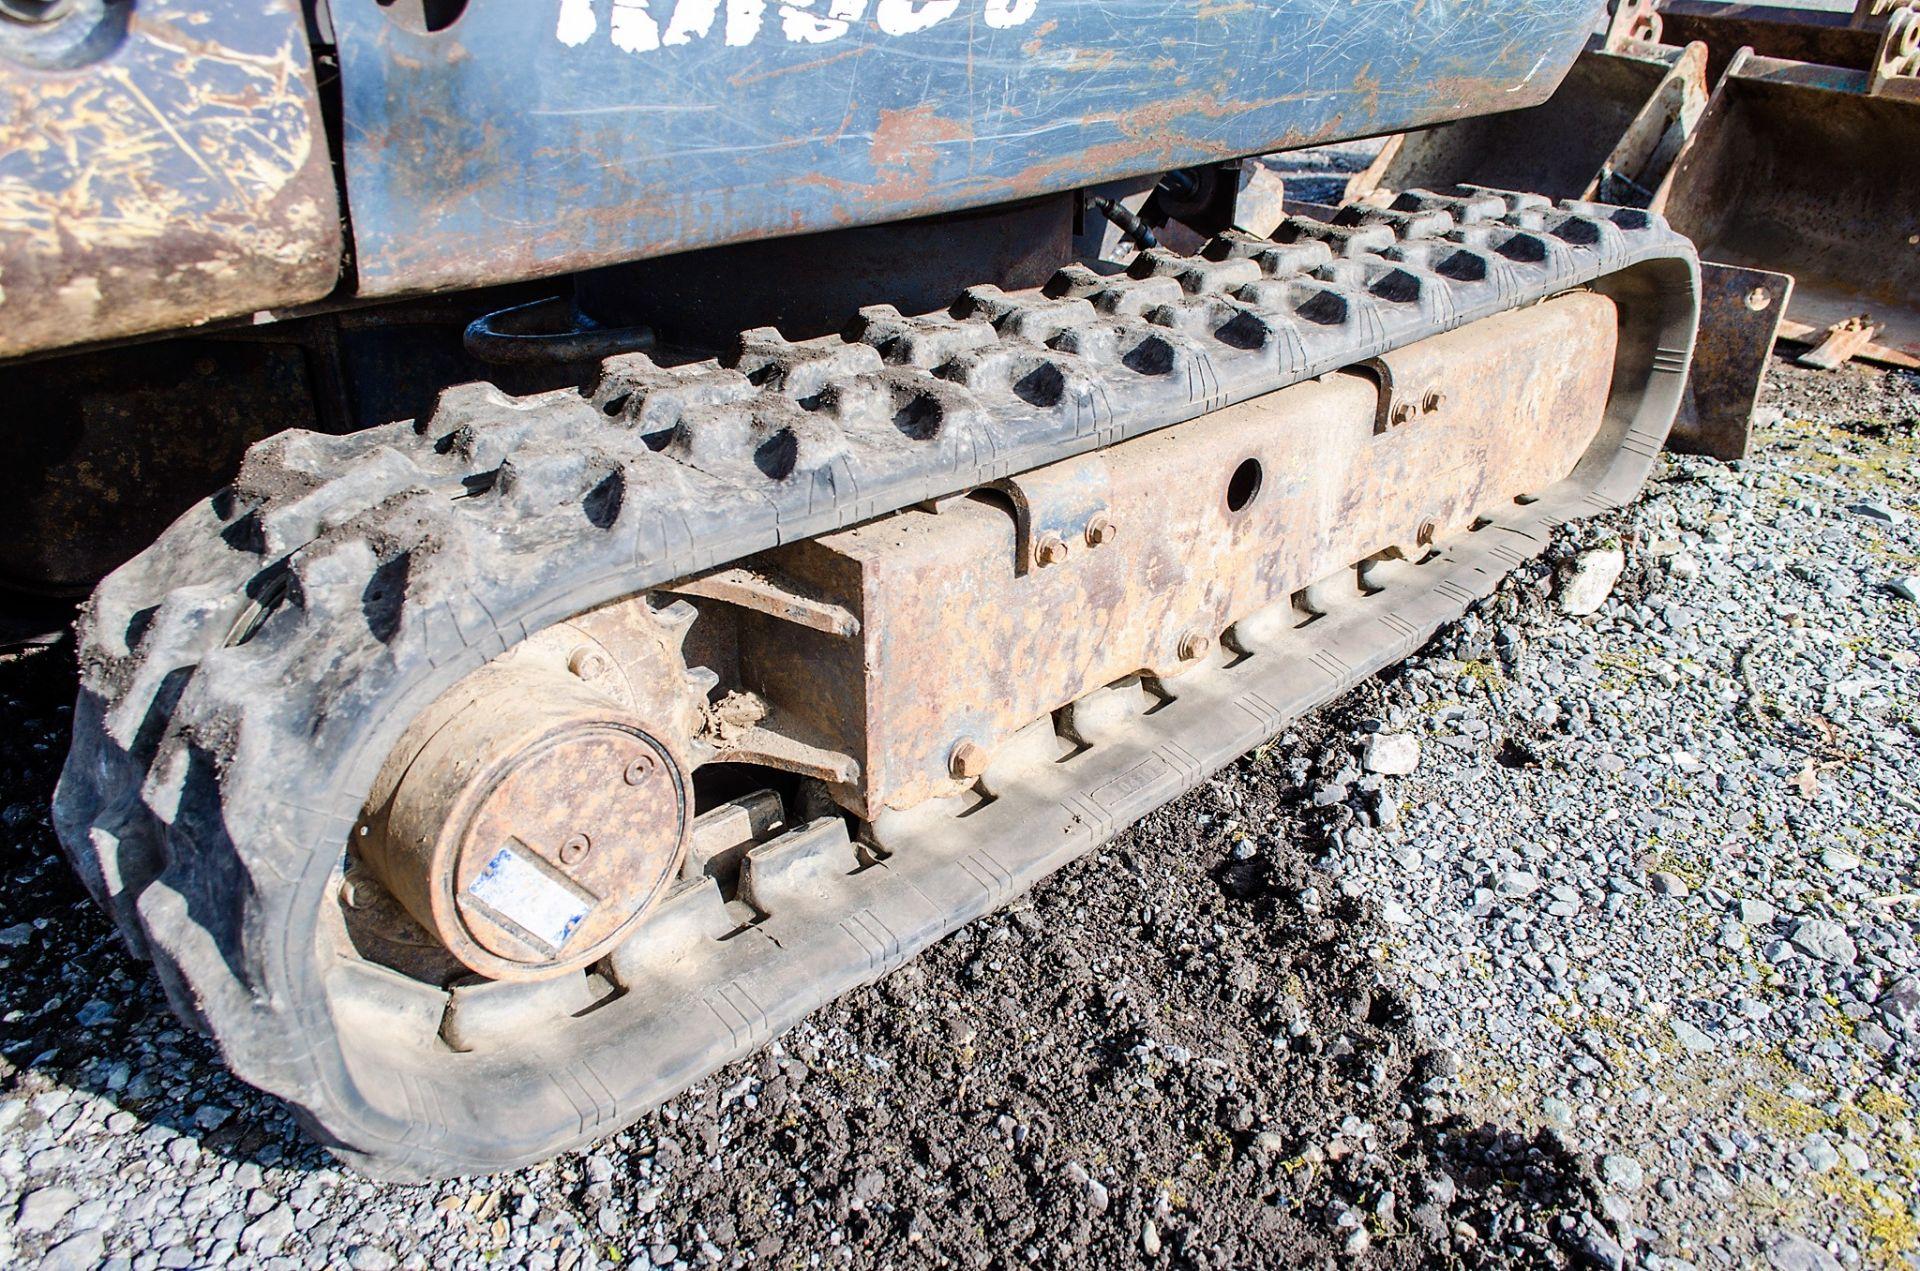 Kubota KX36-3 1.5 tonne rubber tracked mini excavator Year: 2007 S/N: Z077298 Recorded Hours: 4205 - Image 10 of 18